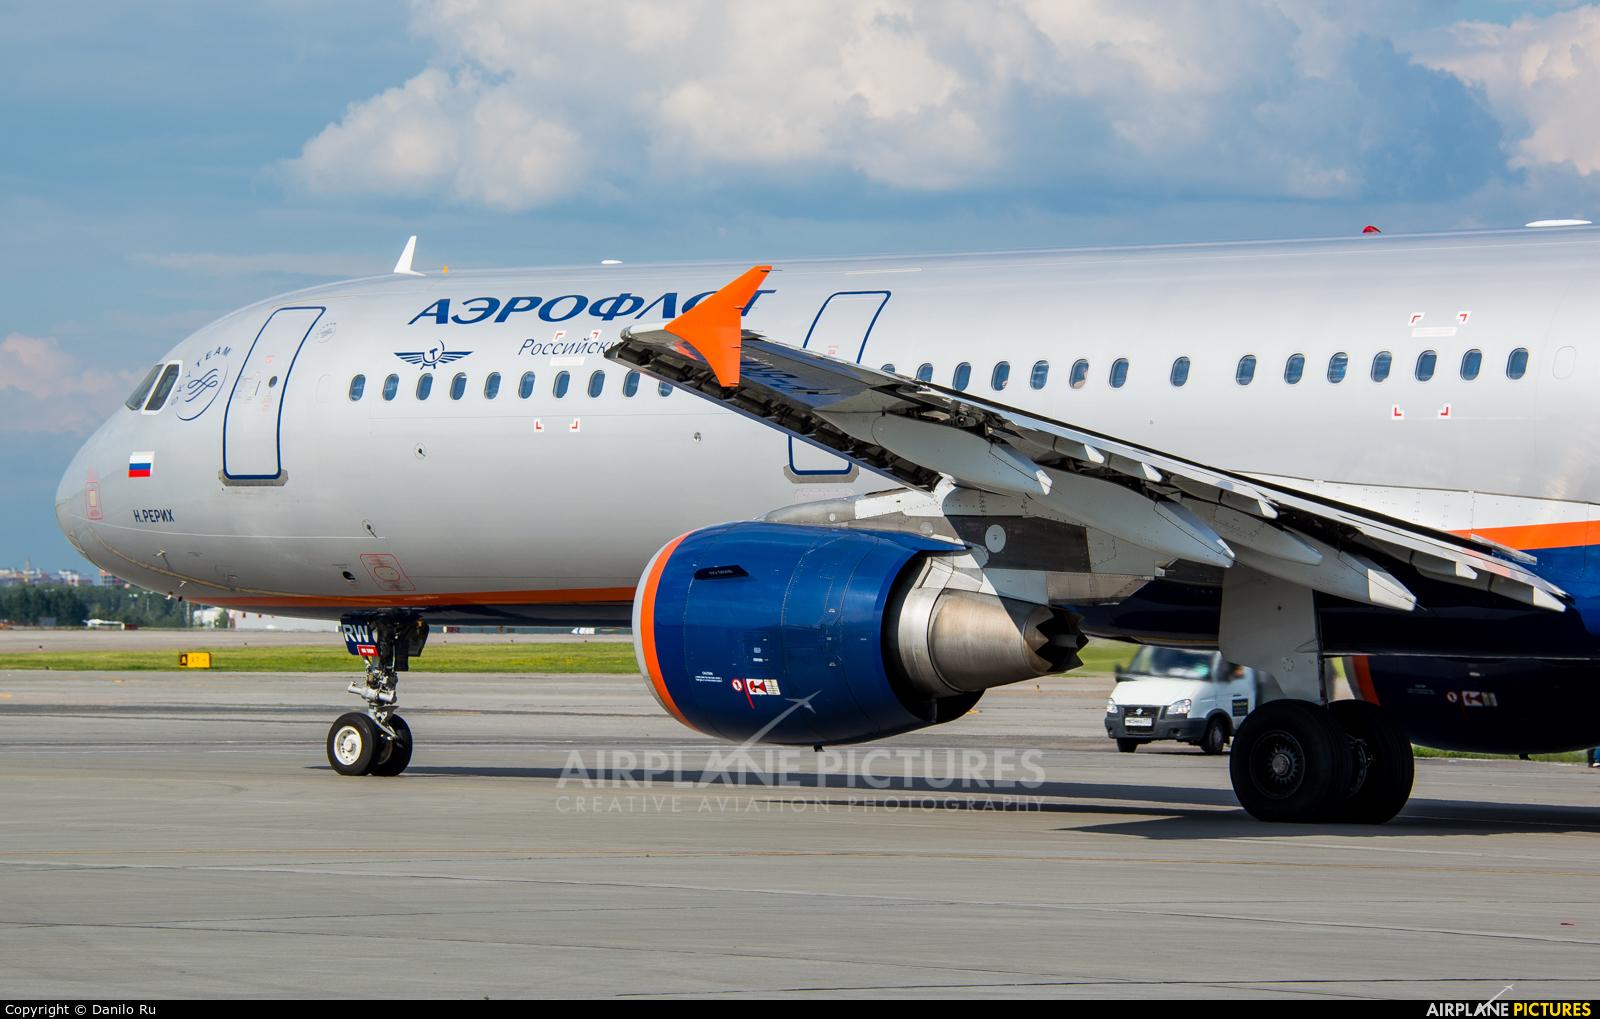 Aeroflot VP-BRW aircraft at Moscow - Sheremetyevo